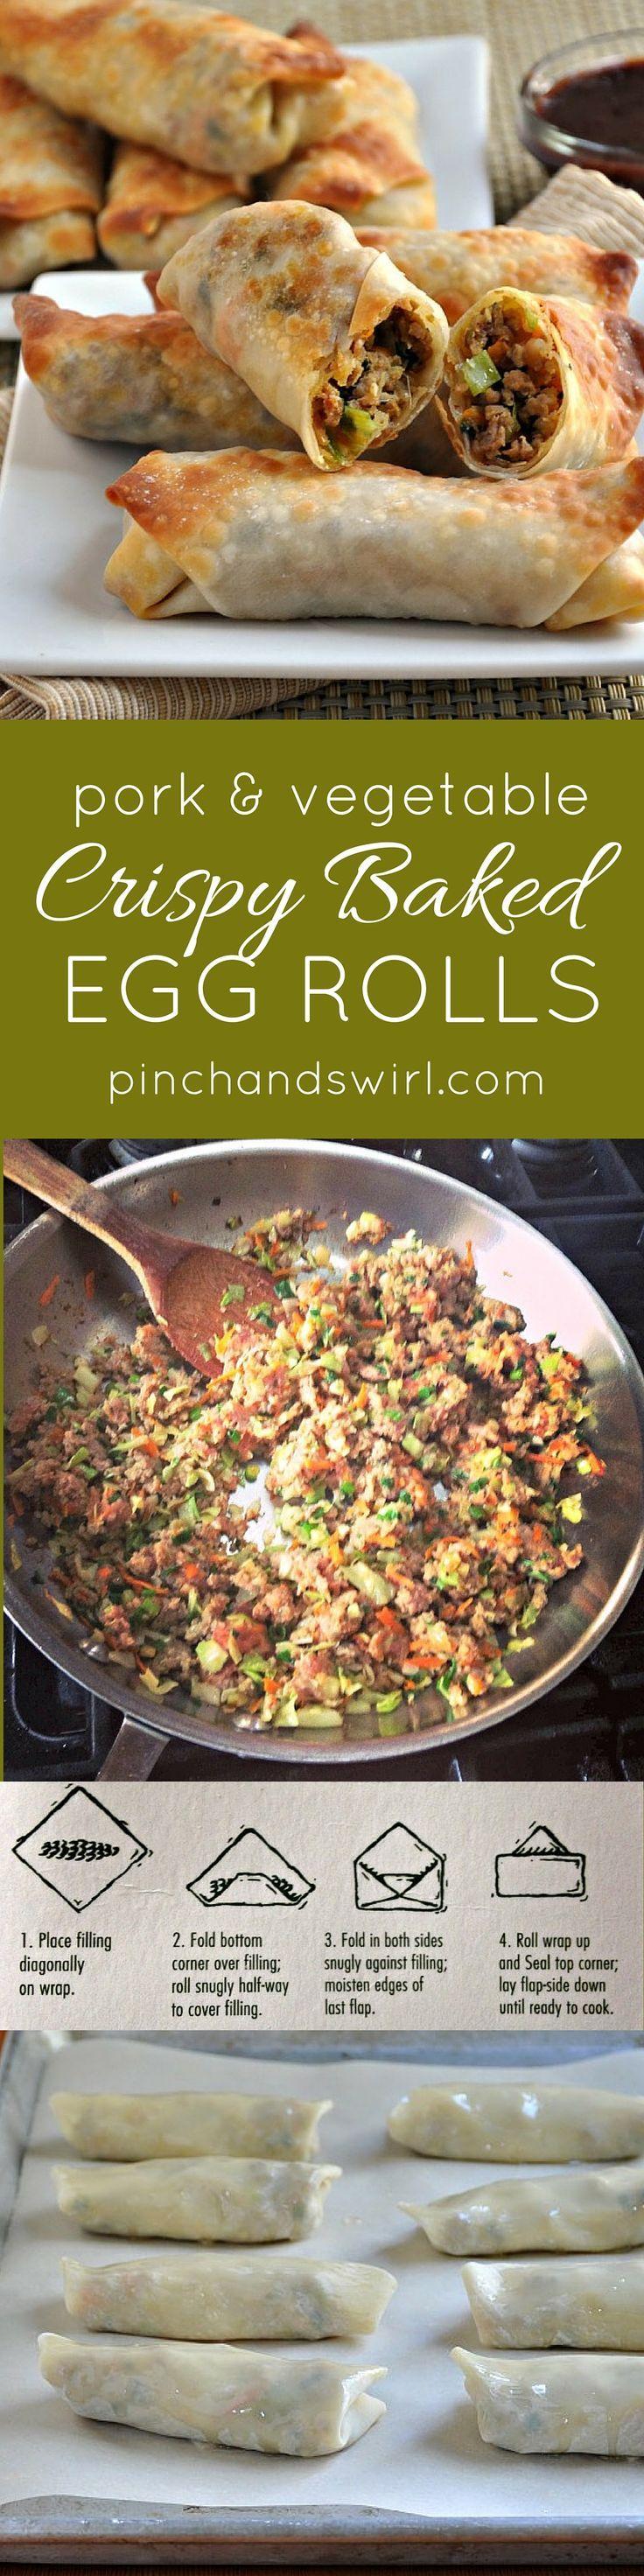 Pork and Vegetable Crispy Baked Egg Rolls - so easy to make and crispy without frying! #healthyrecipes #pork #asianfood